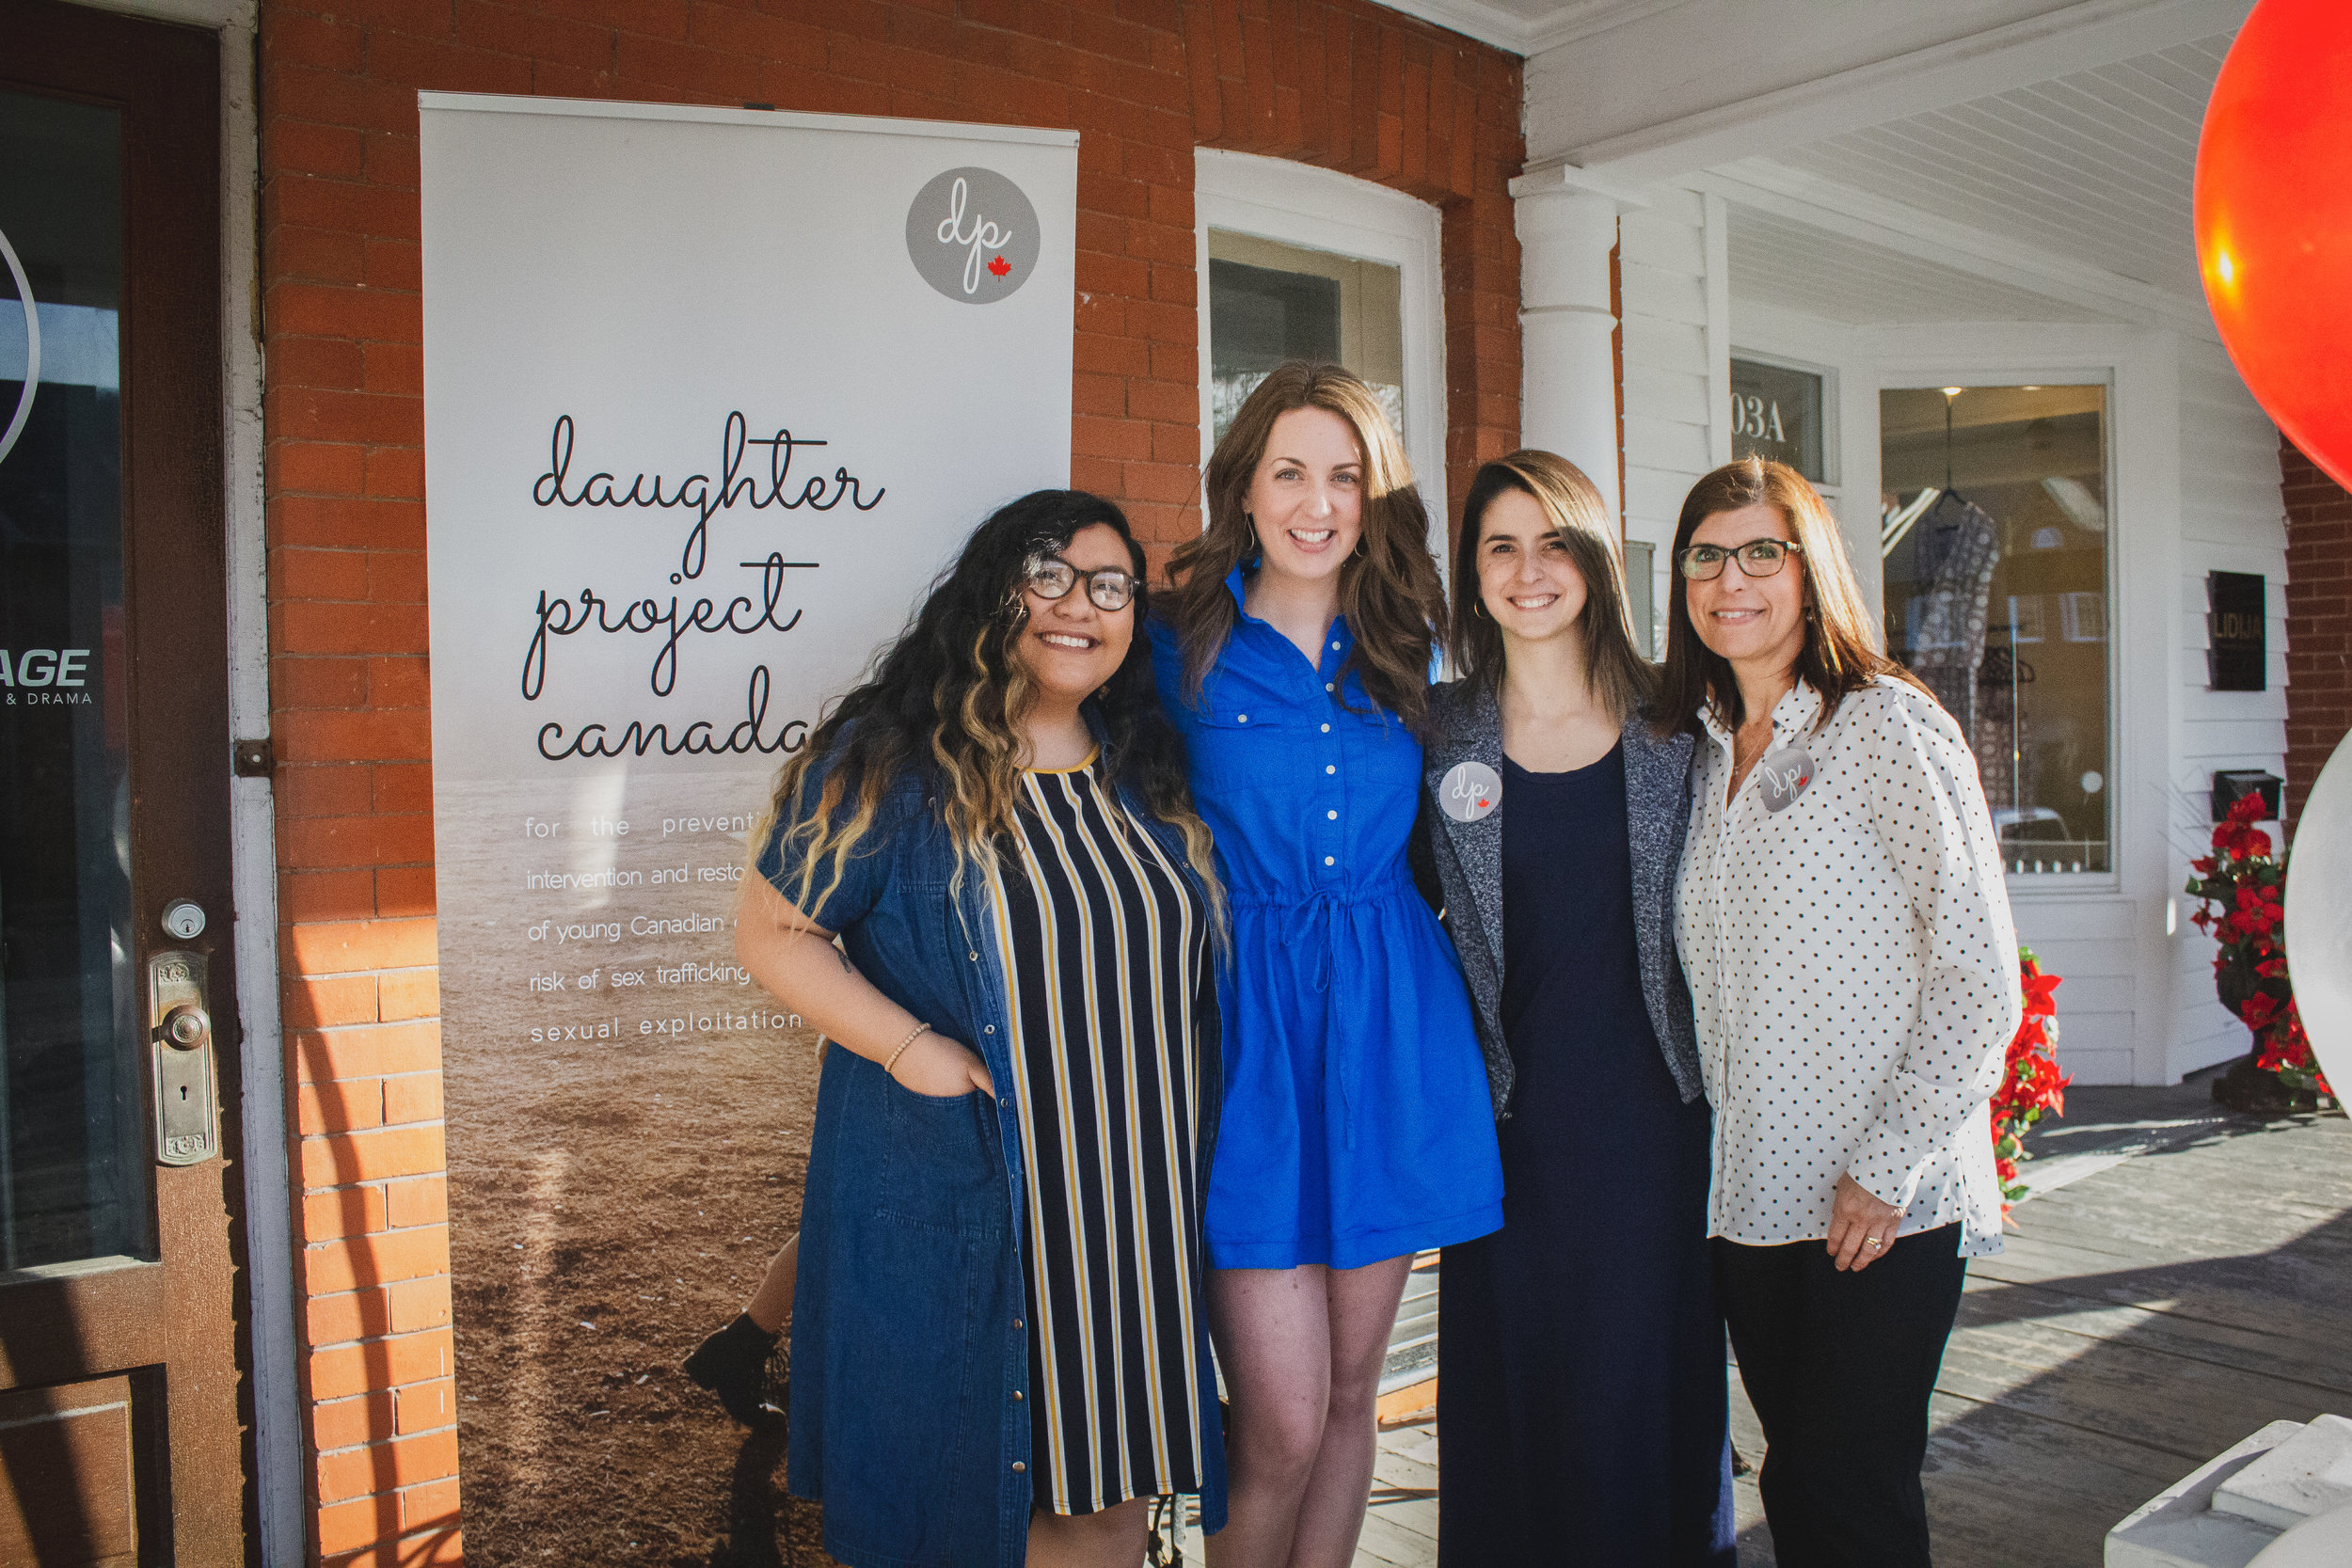 Daughter Project Fundraiser Team (left to right): Naomi Laserna, Kristin Szabo, Rebecca Laserna, & DPC Executive Director Cathy Tollefson